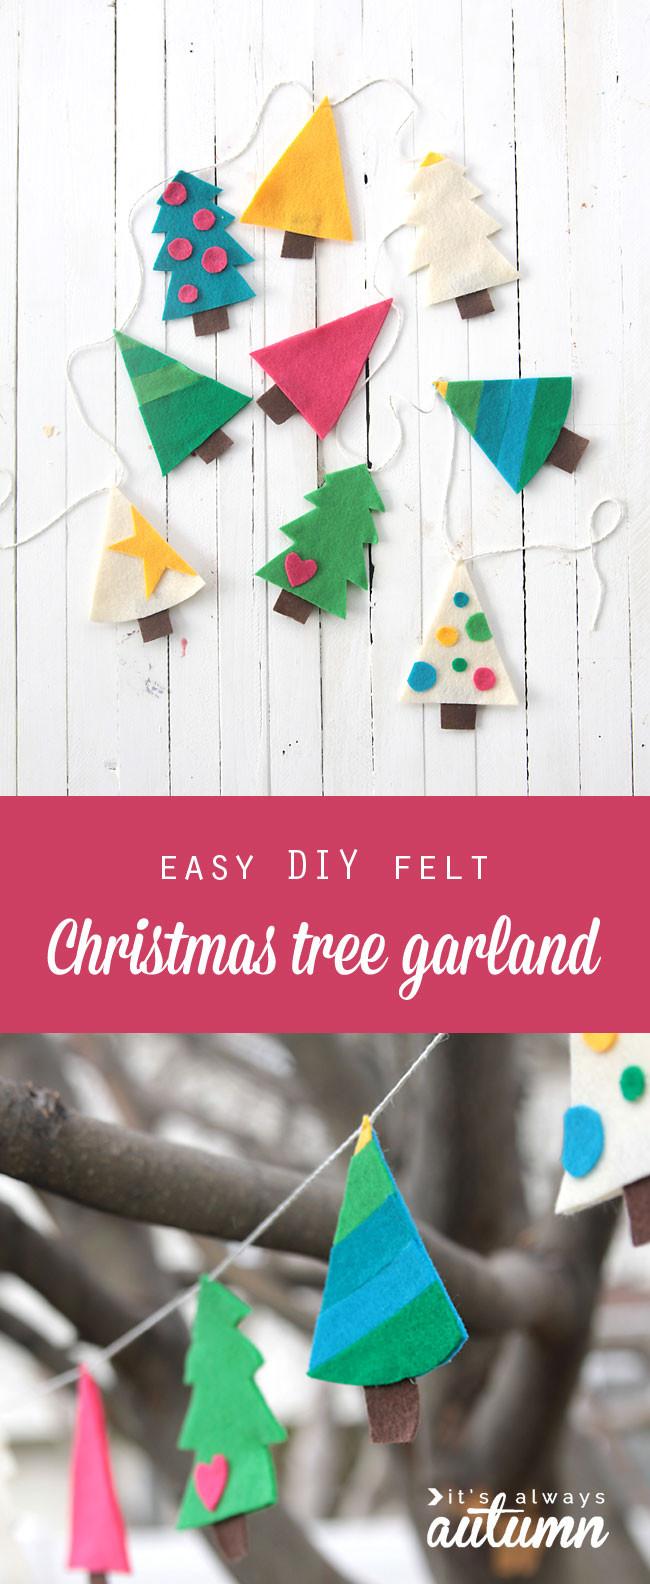 DIY Christmas Tree Garland  easy DIY felt Christmas tree garland simple holiday decor